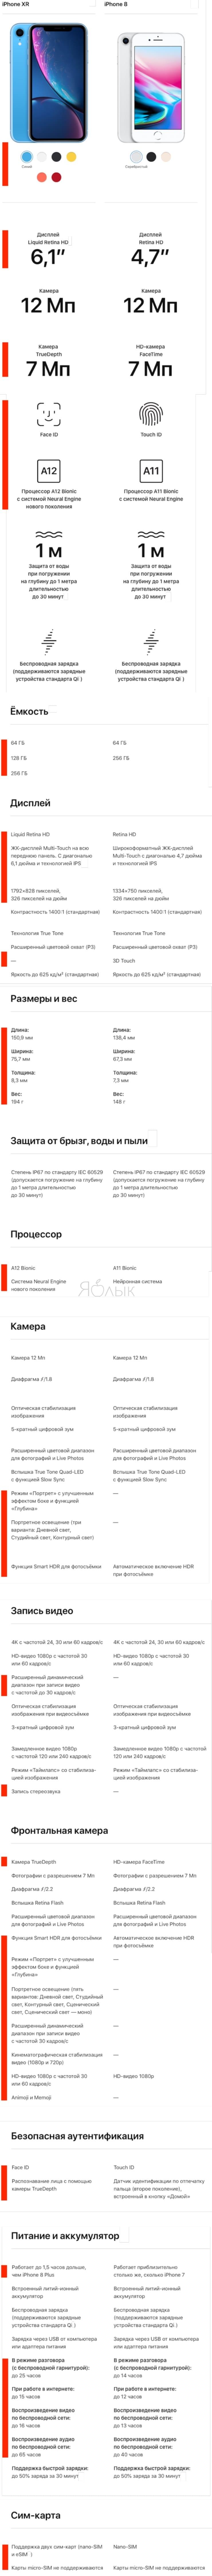 Подробное сравнение спецификаций (характеристик) iPhone XR и iPhone 8